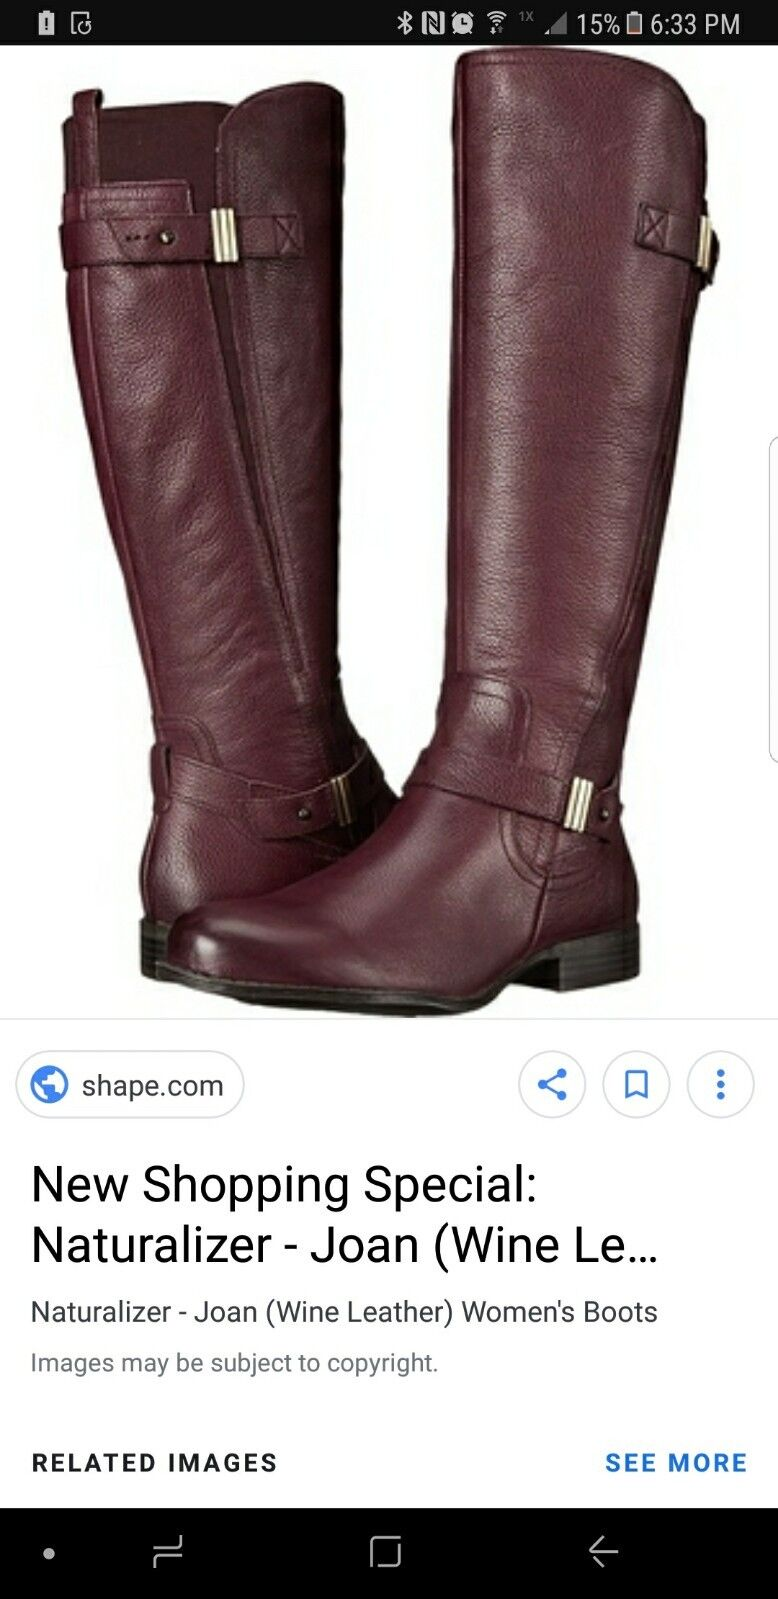 naturalizer Jean wine color boots 11